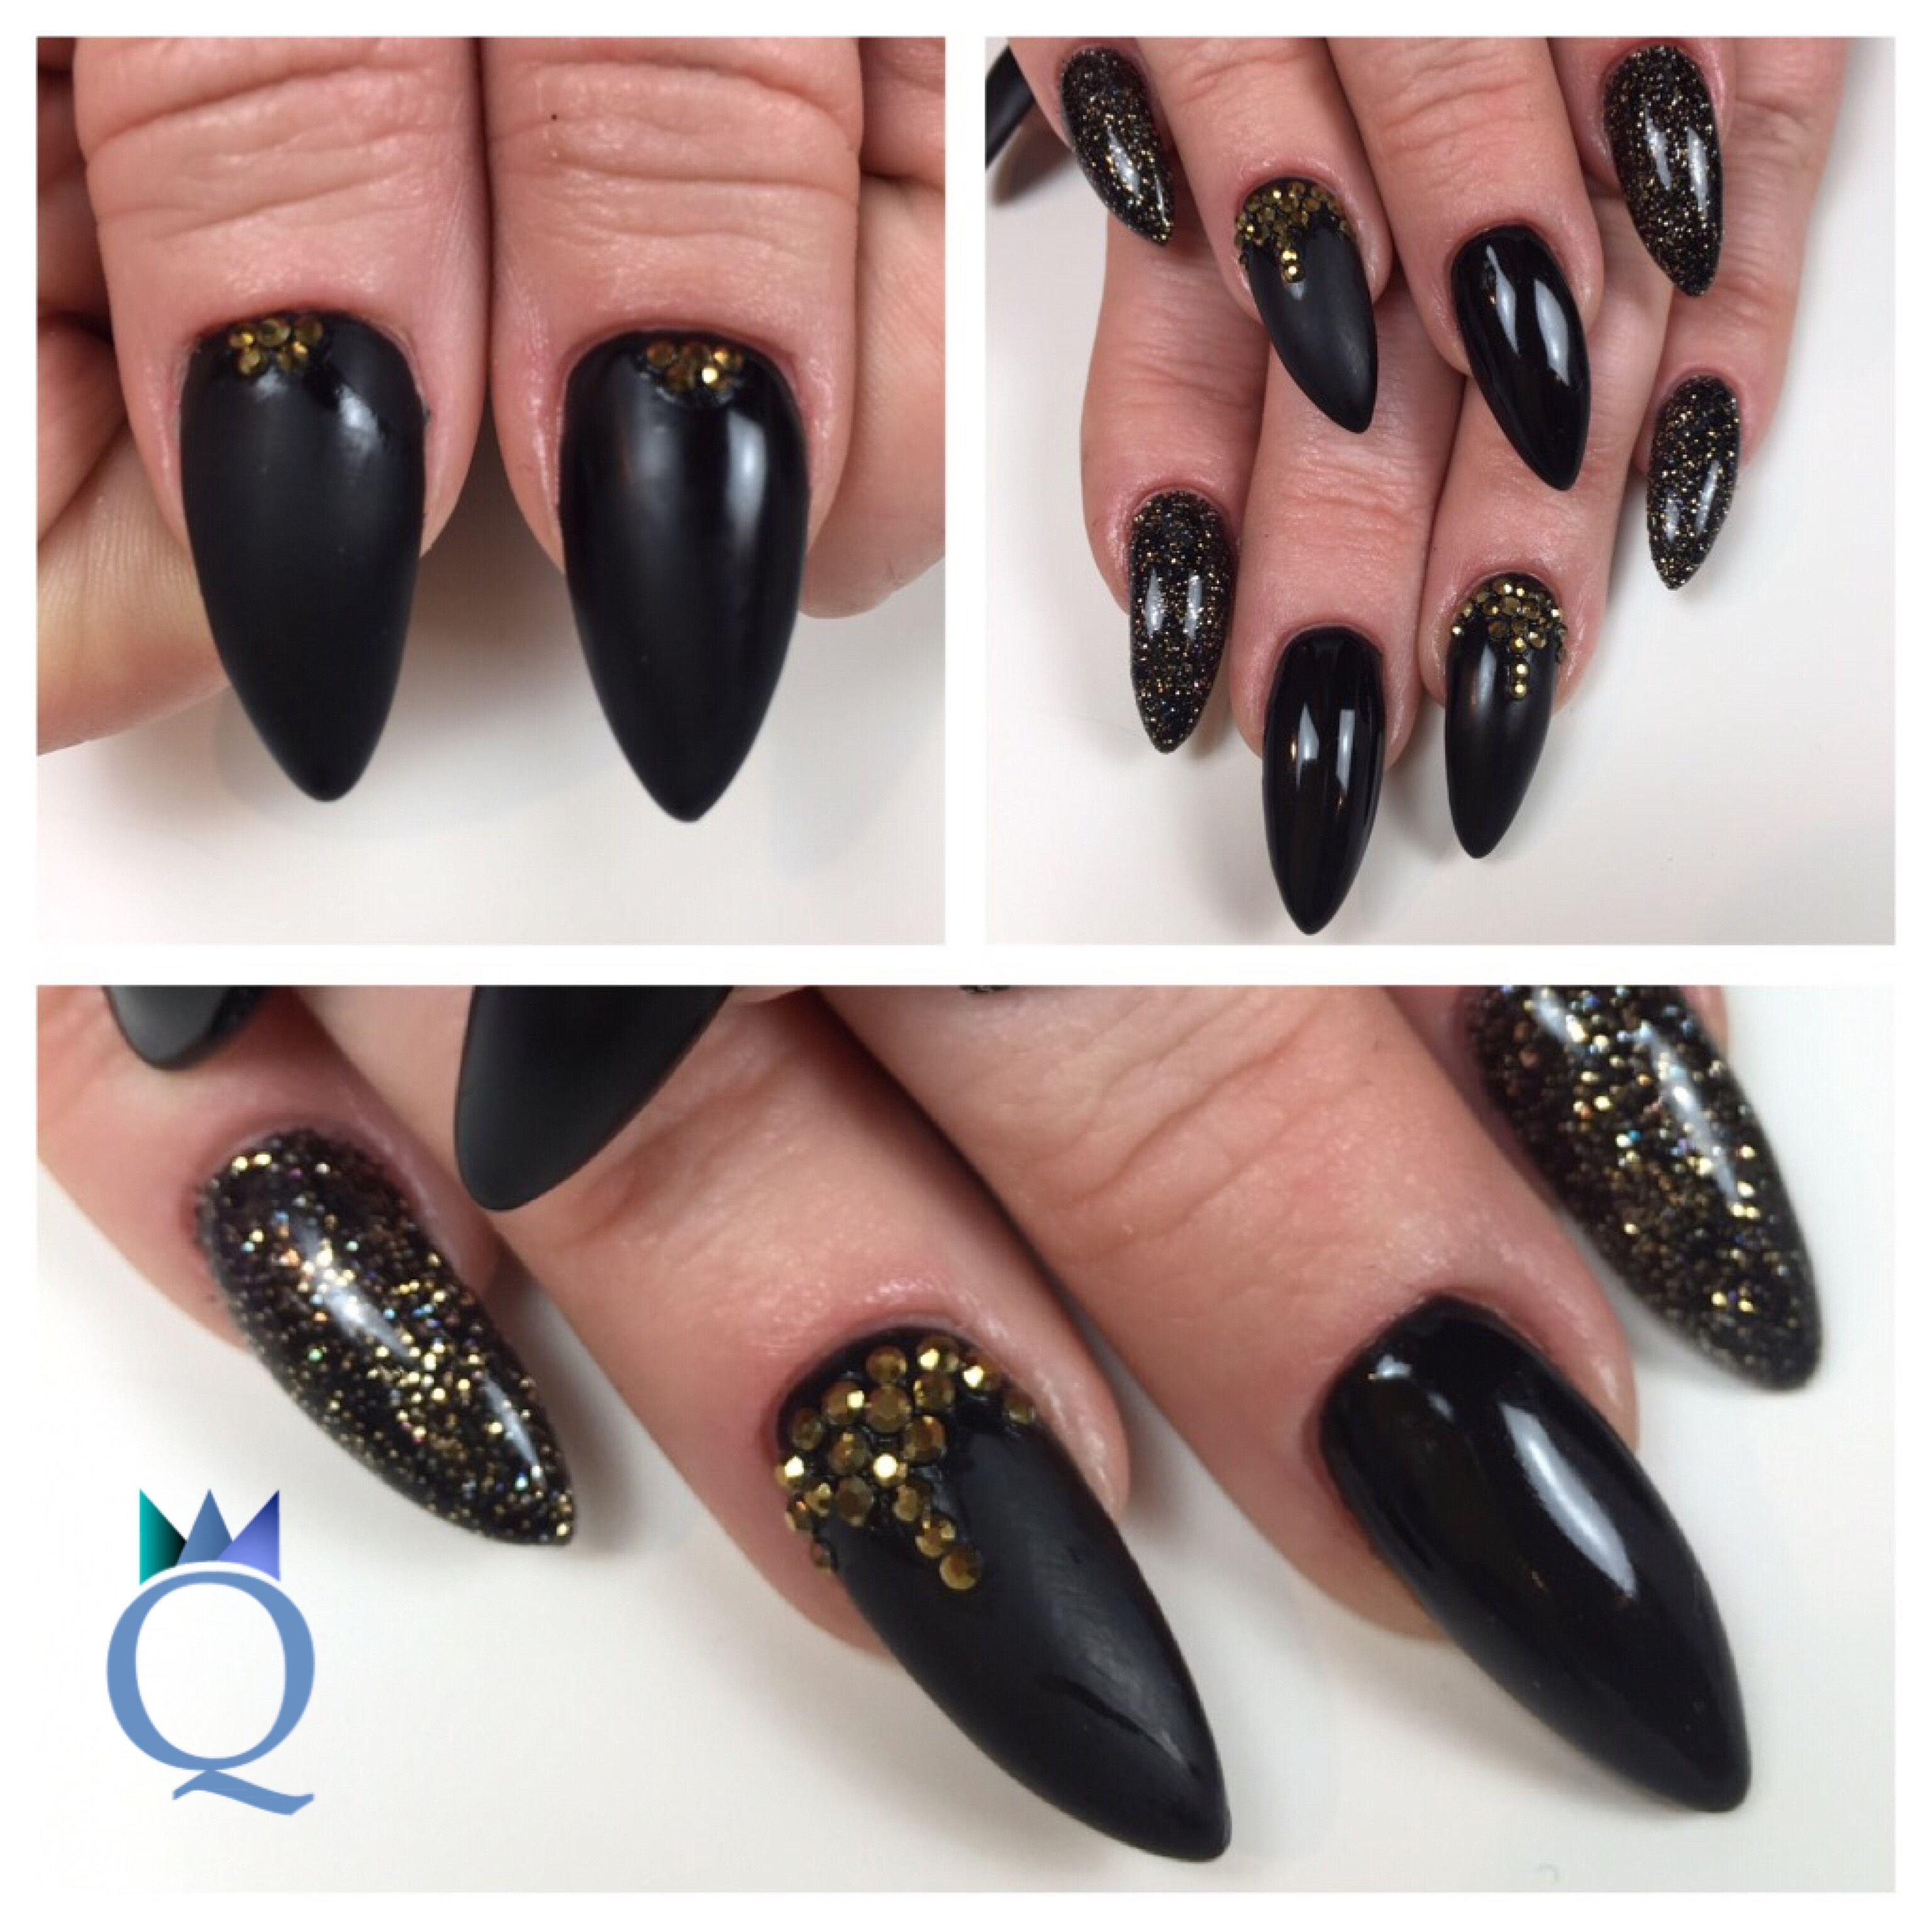 Amüsant Nägel Schwarz Matt Foto Von #almondnails #longnails #gelnails #nails #black #mat #glossy